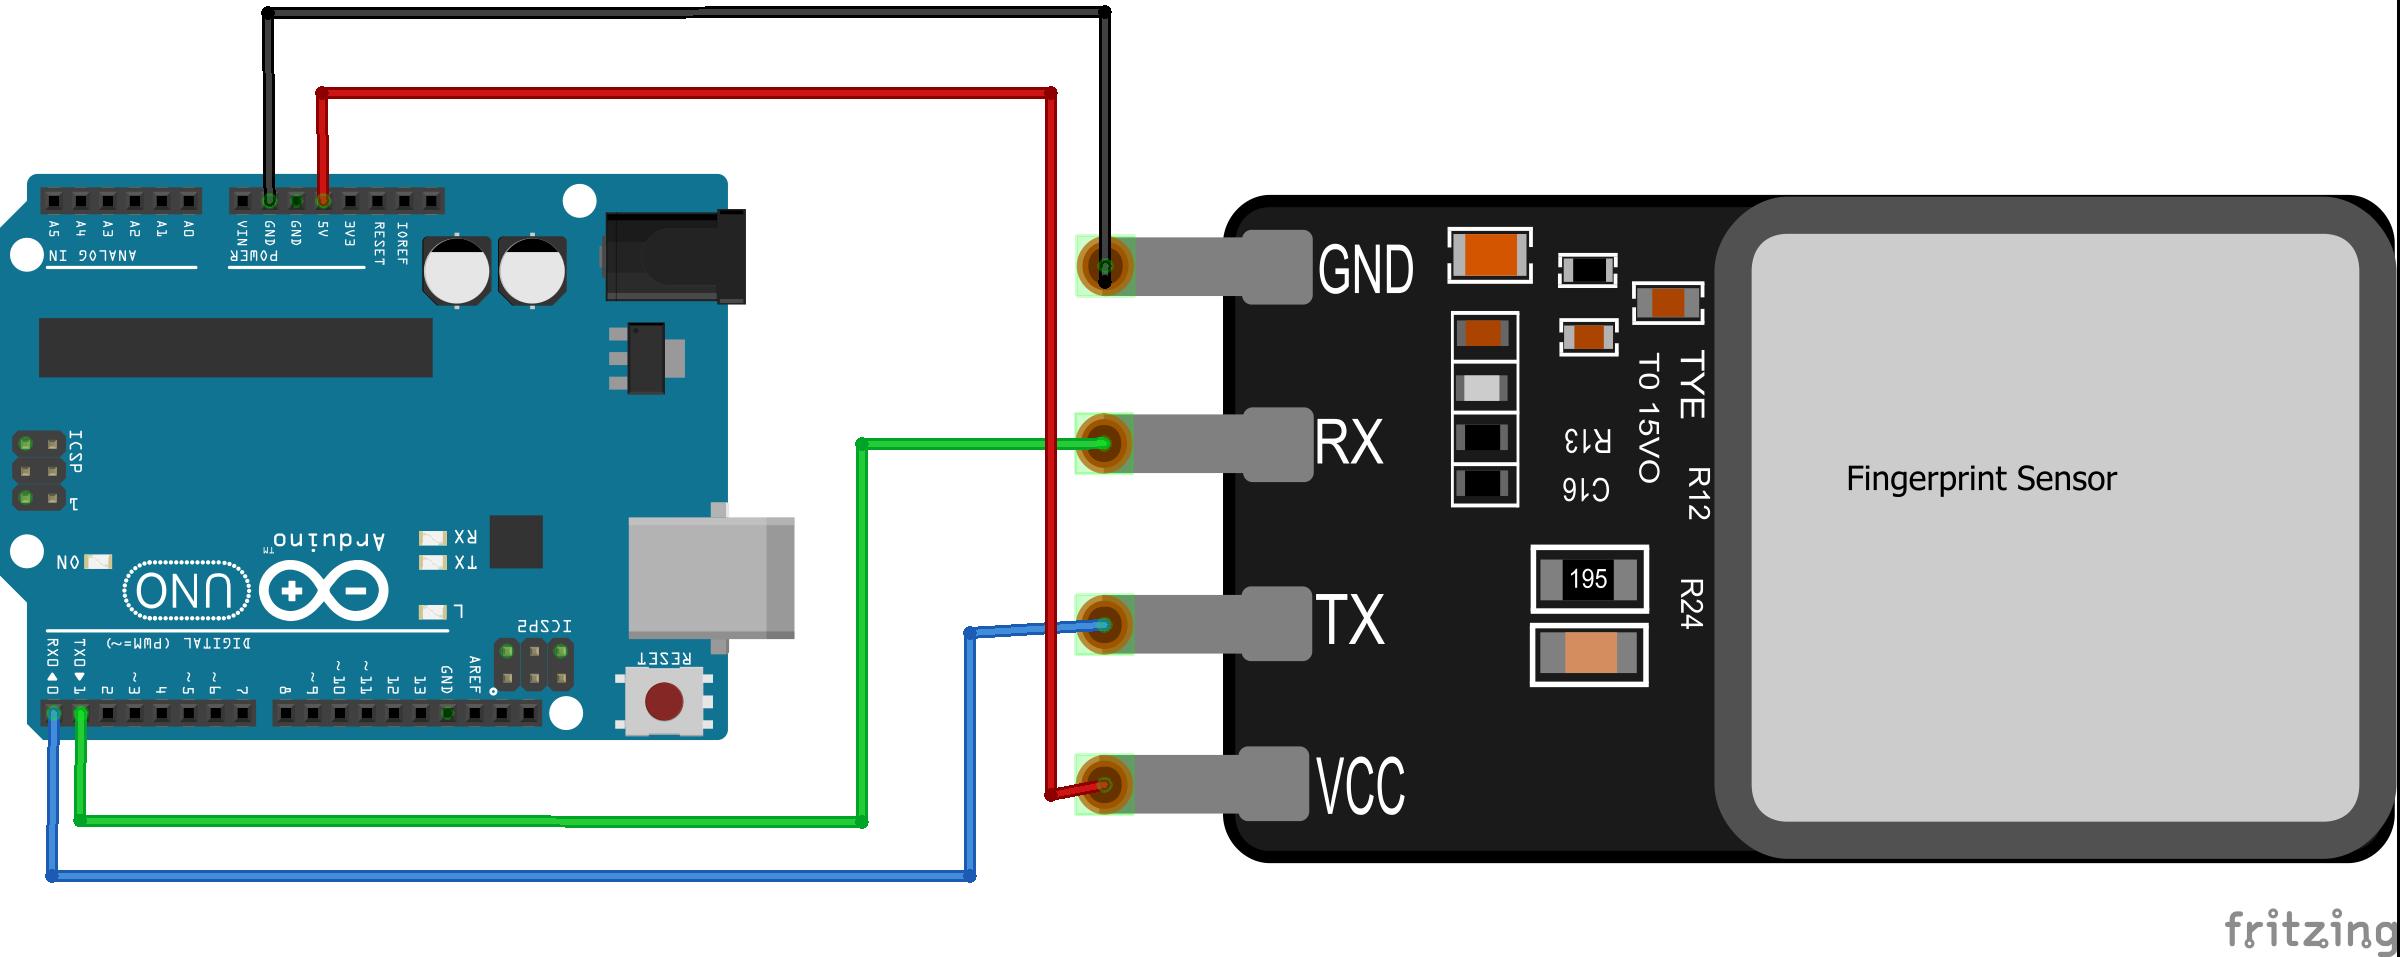 Fingerprint Sensor with an Arduino or an ESP - Hackster io